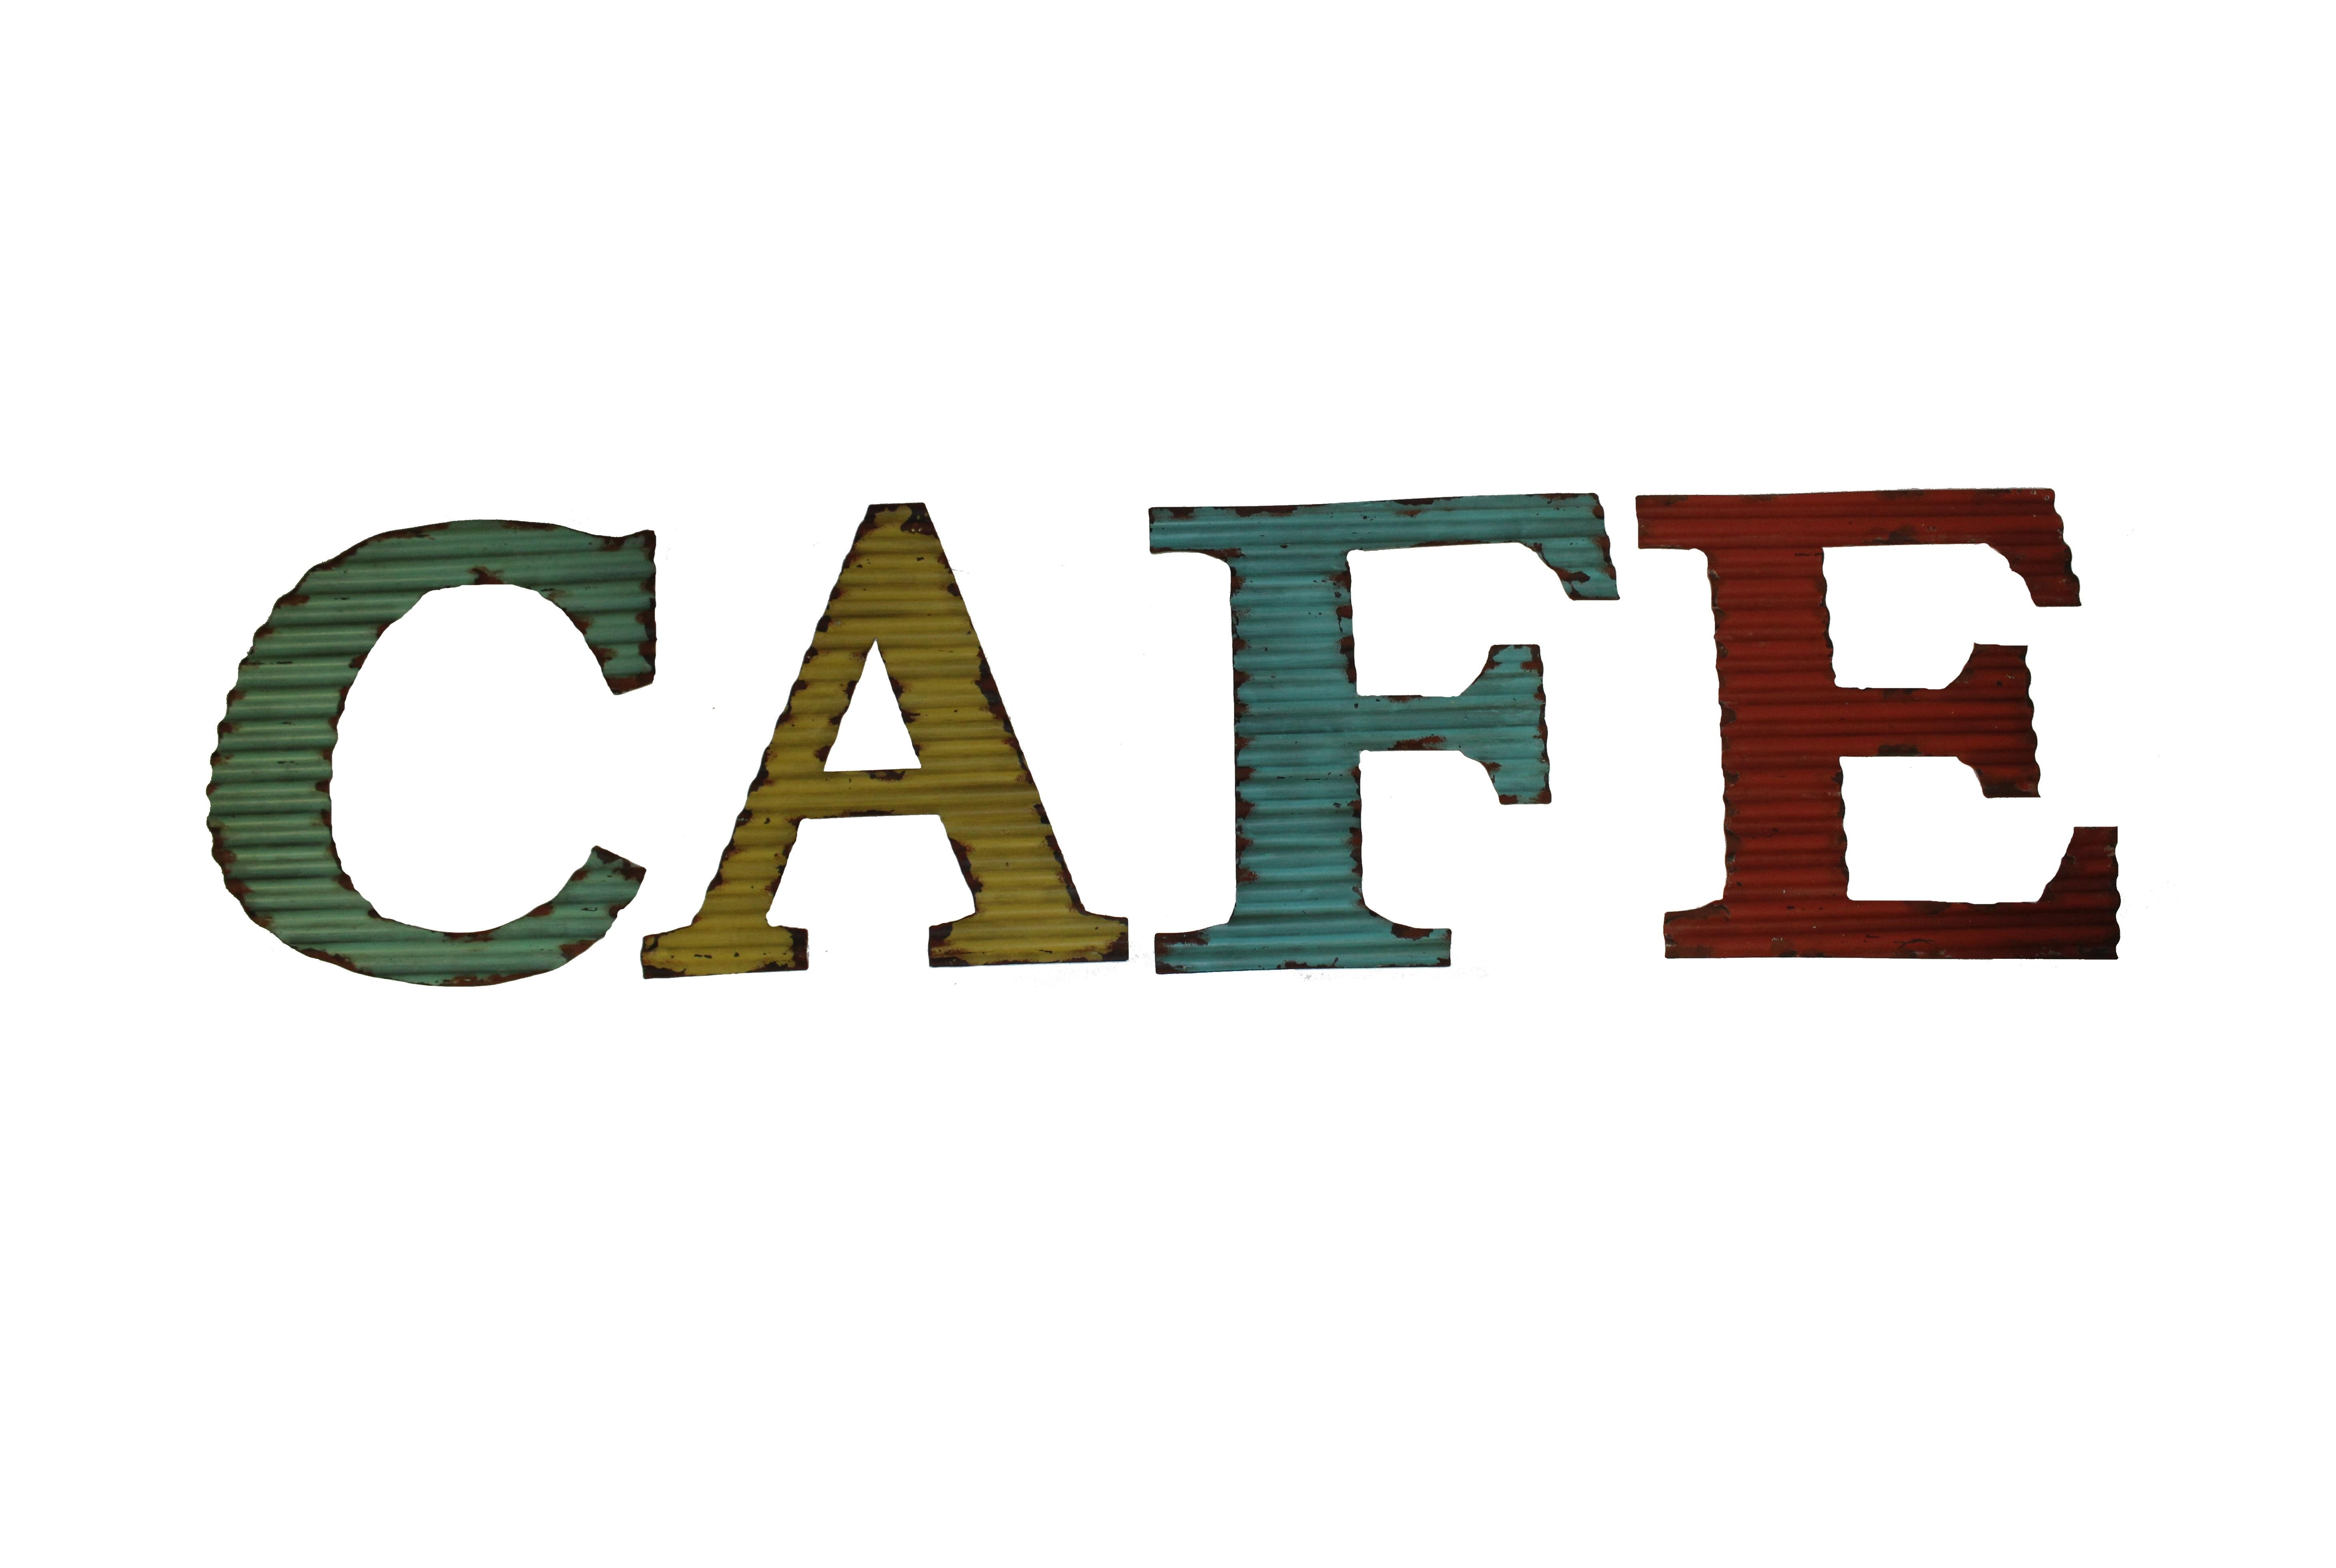 Табличка со словом CafeДругое<br>Материал: Железо<br><br>Material: Железо<br>Length см: None<br>Width см: 33<br>Depth см: 8<br>Height см: 33